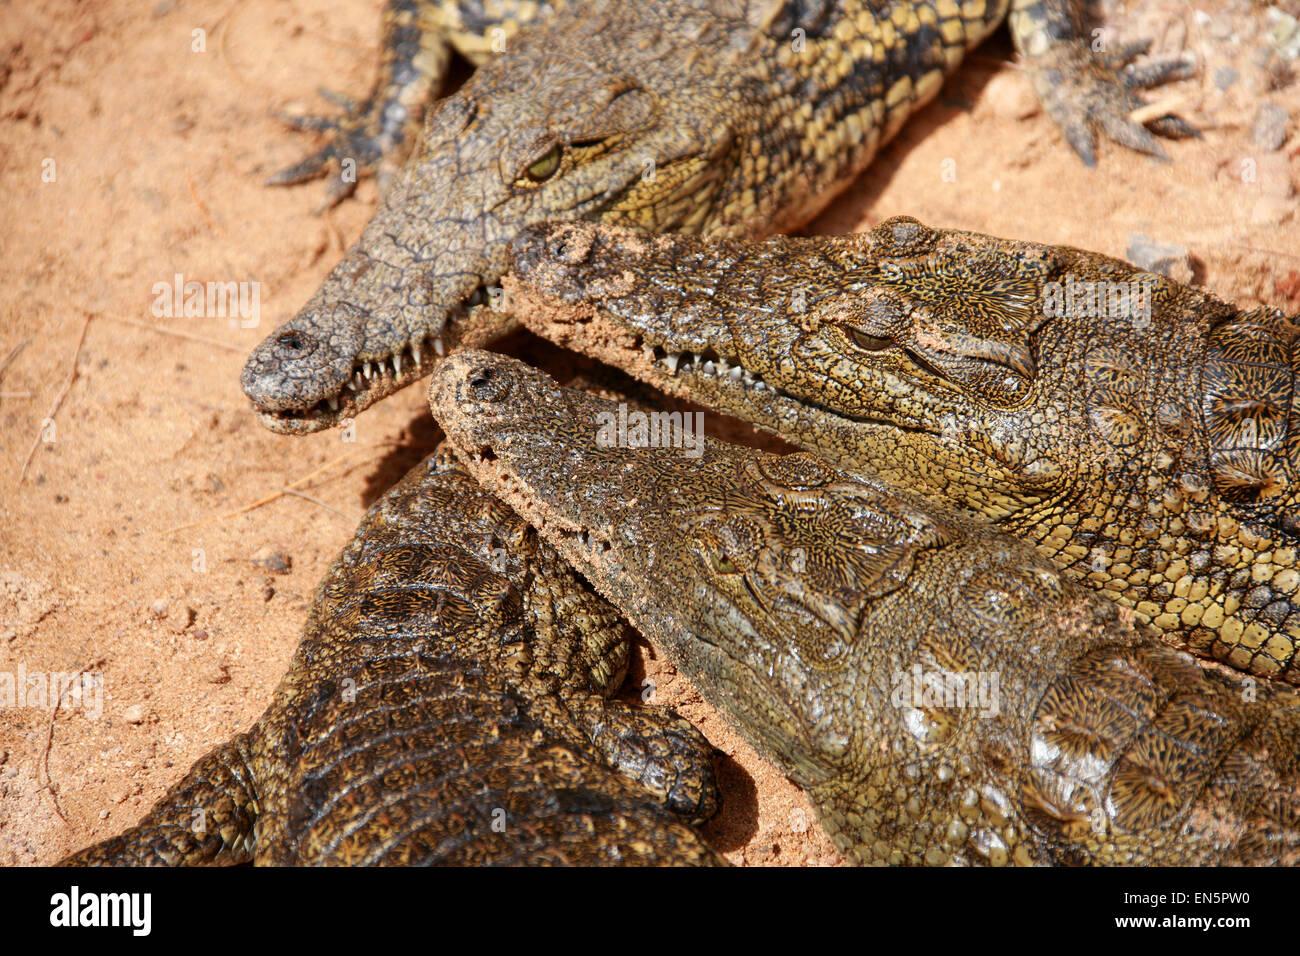 Nile Crocodile, Crocodylus niloticus, Crocodylidae. - Stock Image